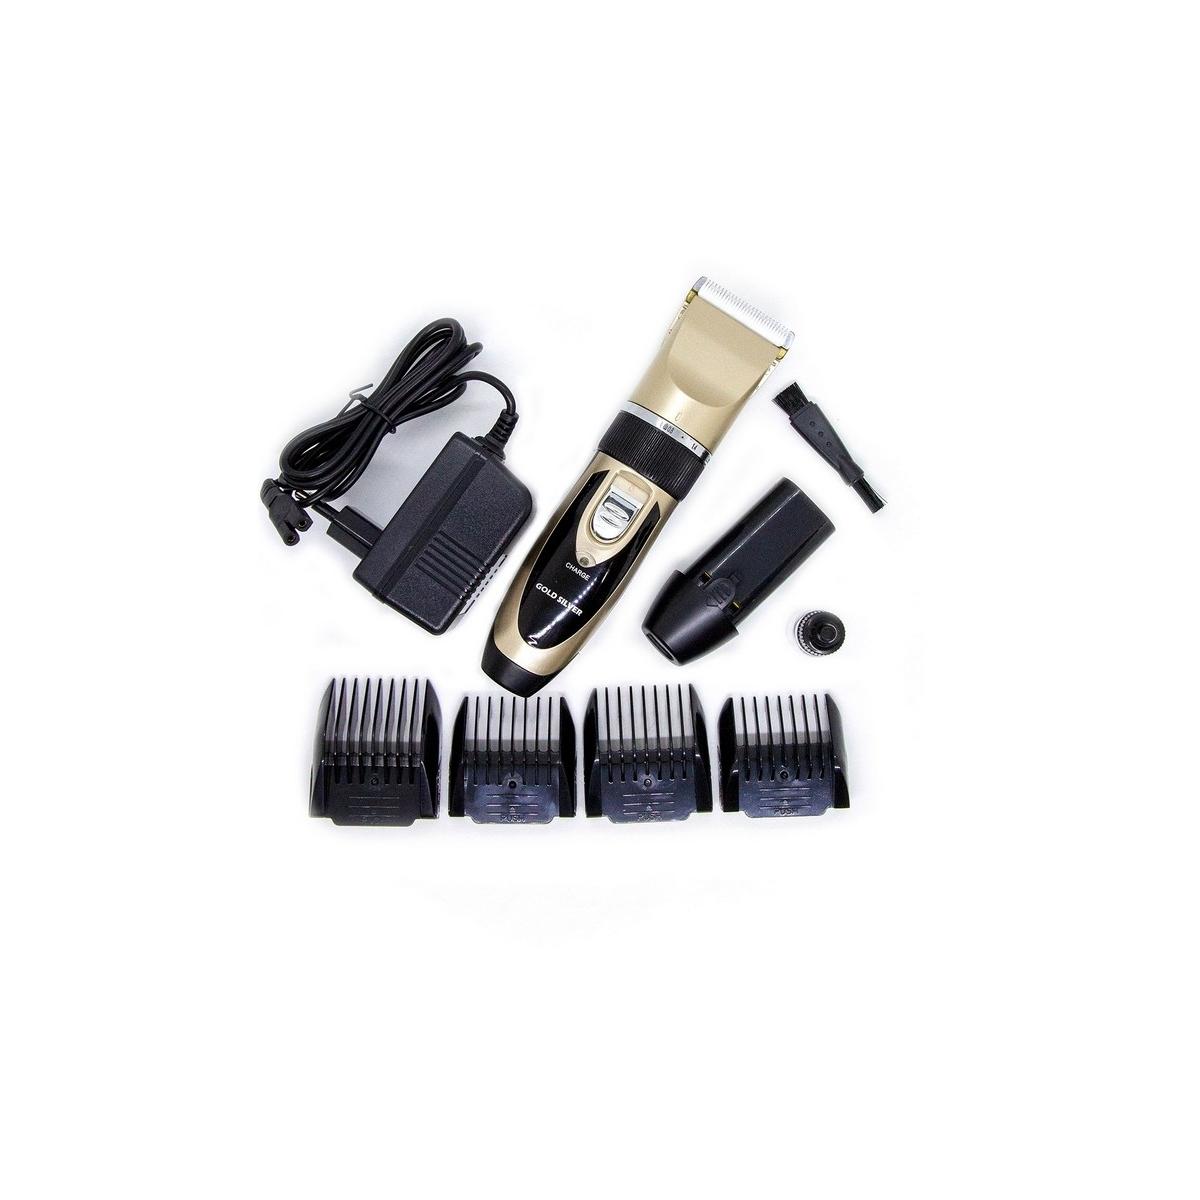 Gold Sılver Gs-155 Profesyonel Saç Sakal Traş Makinesi